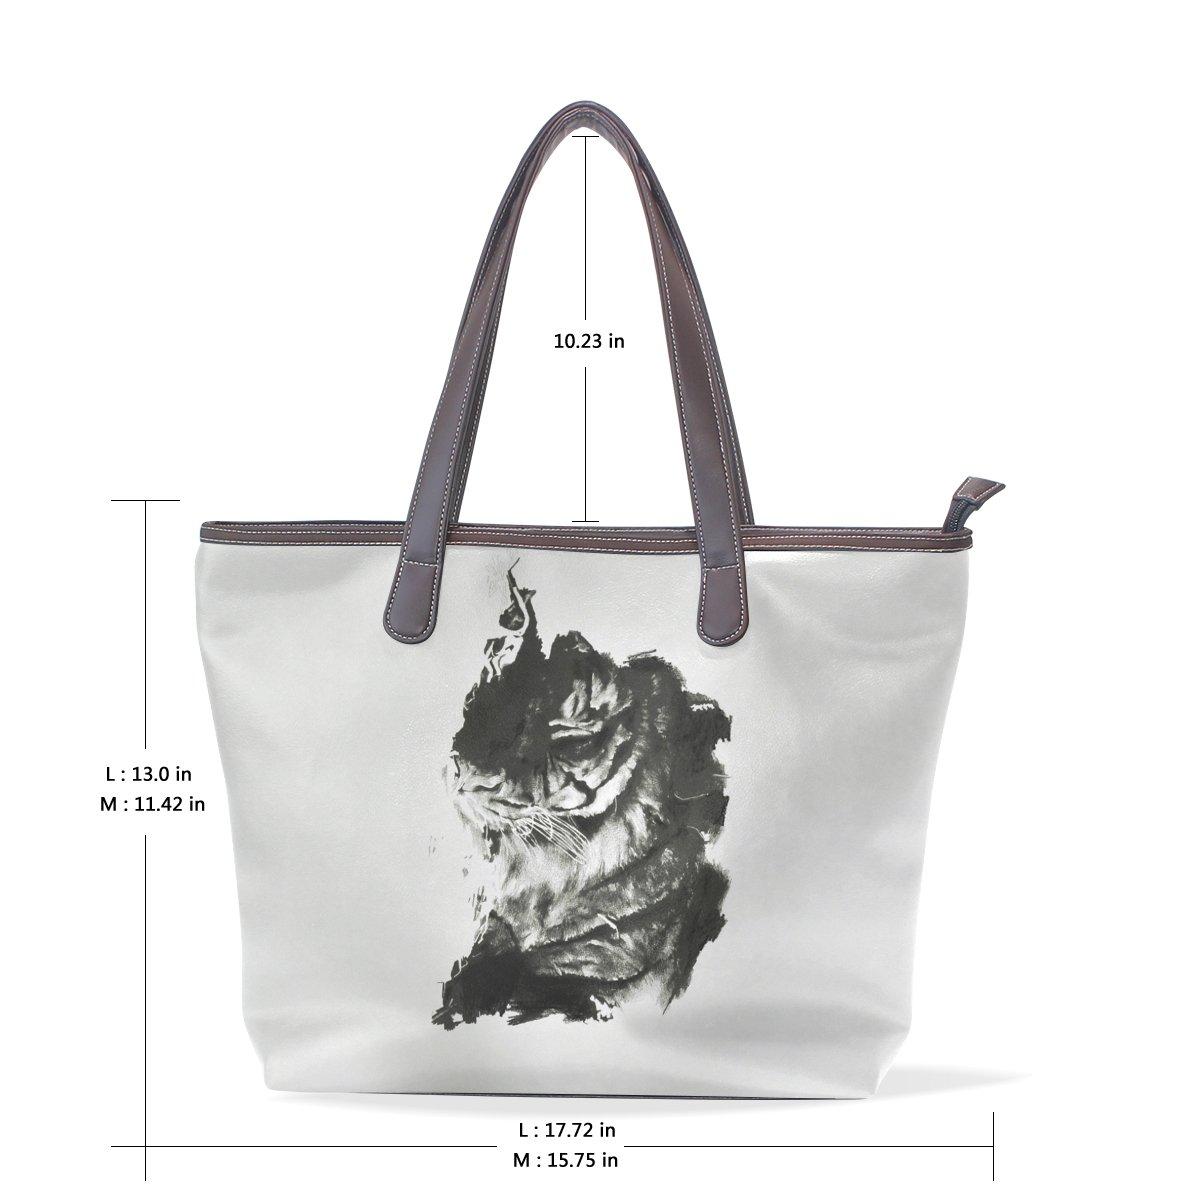 BYouLockX Sleeping Tiger Pattern Leather Handbags Satchel ShoulderBag for Women